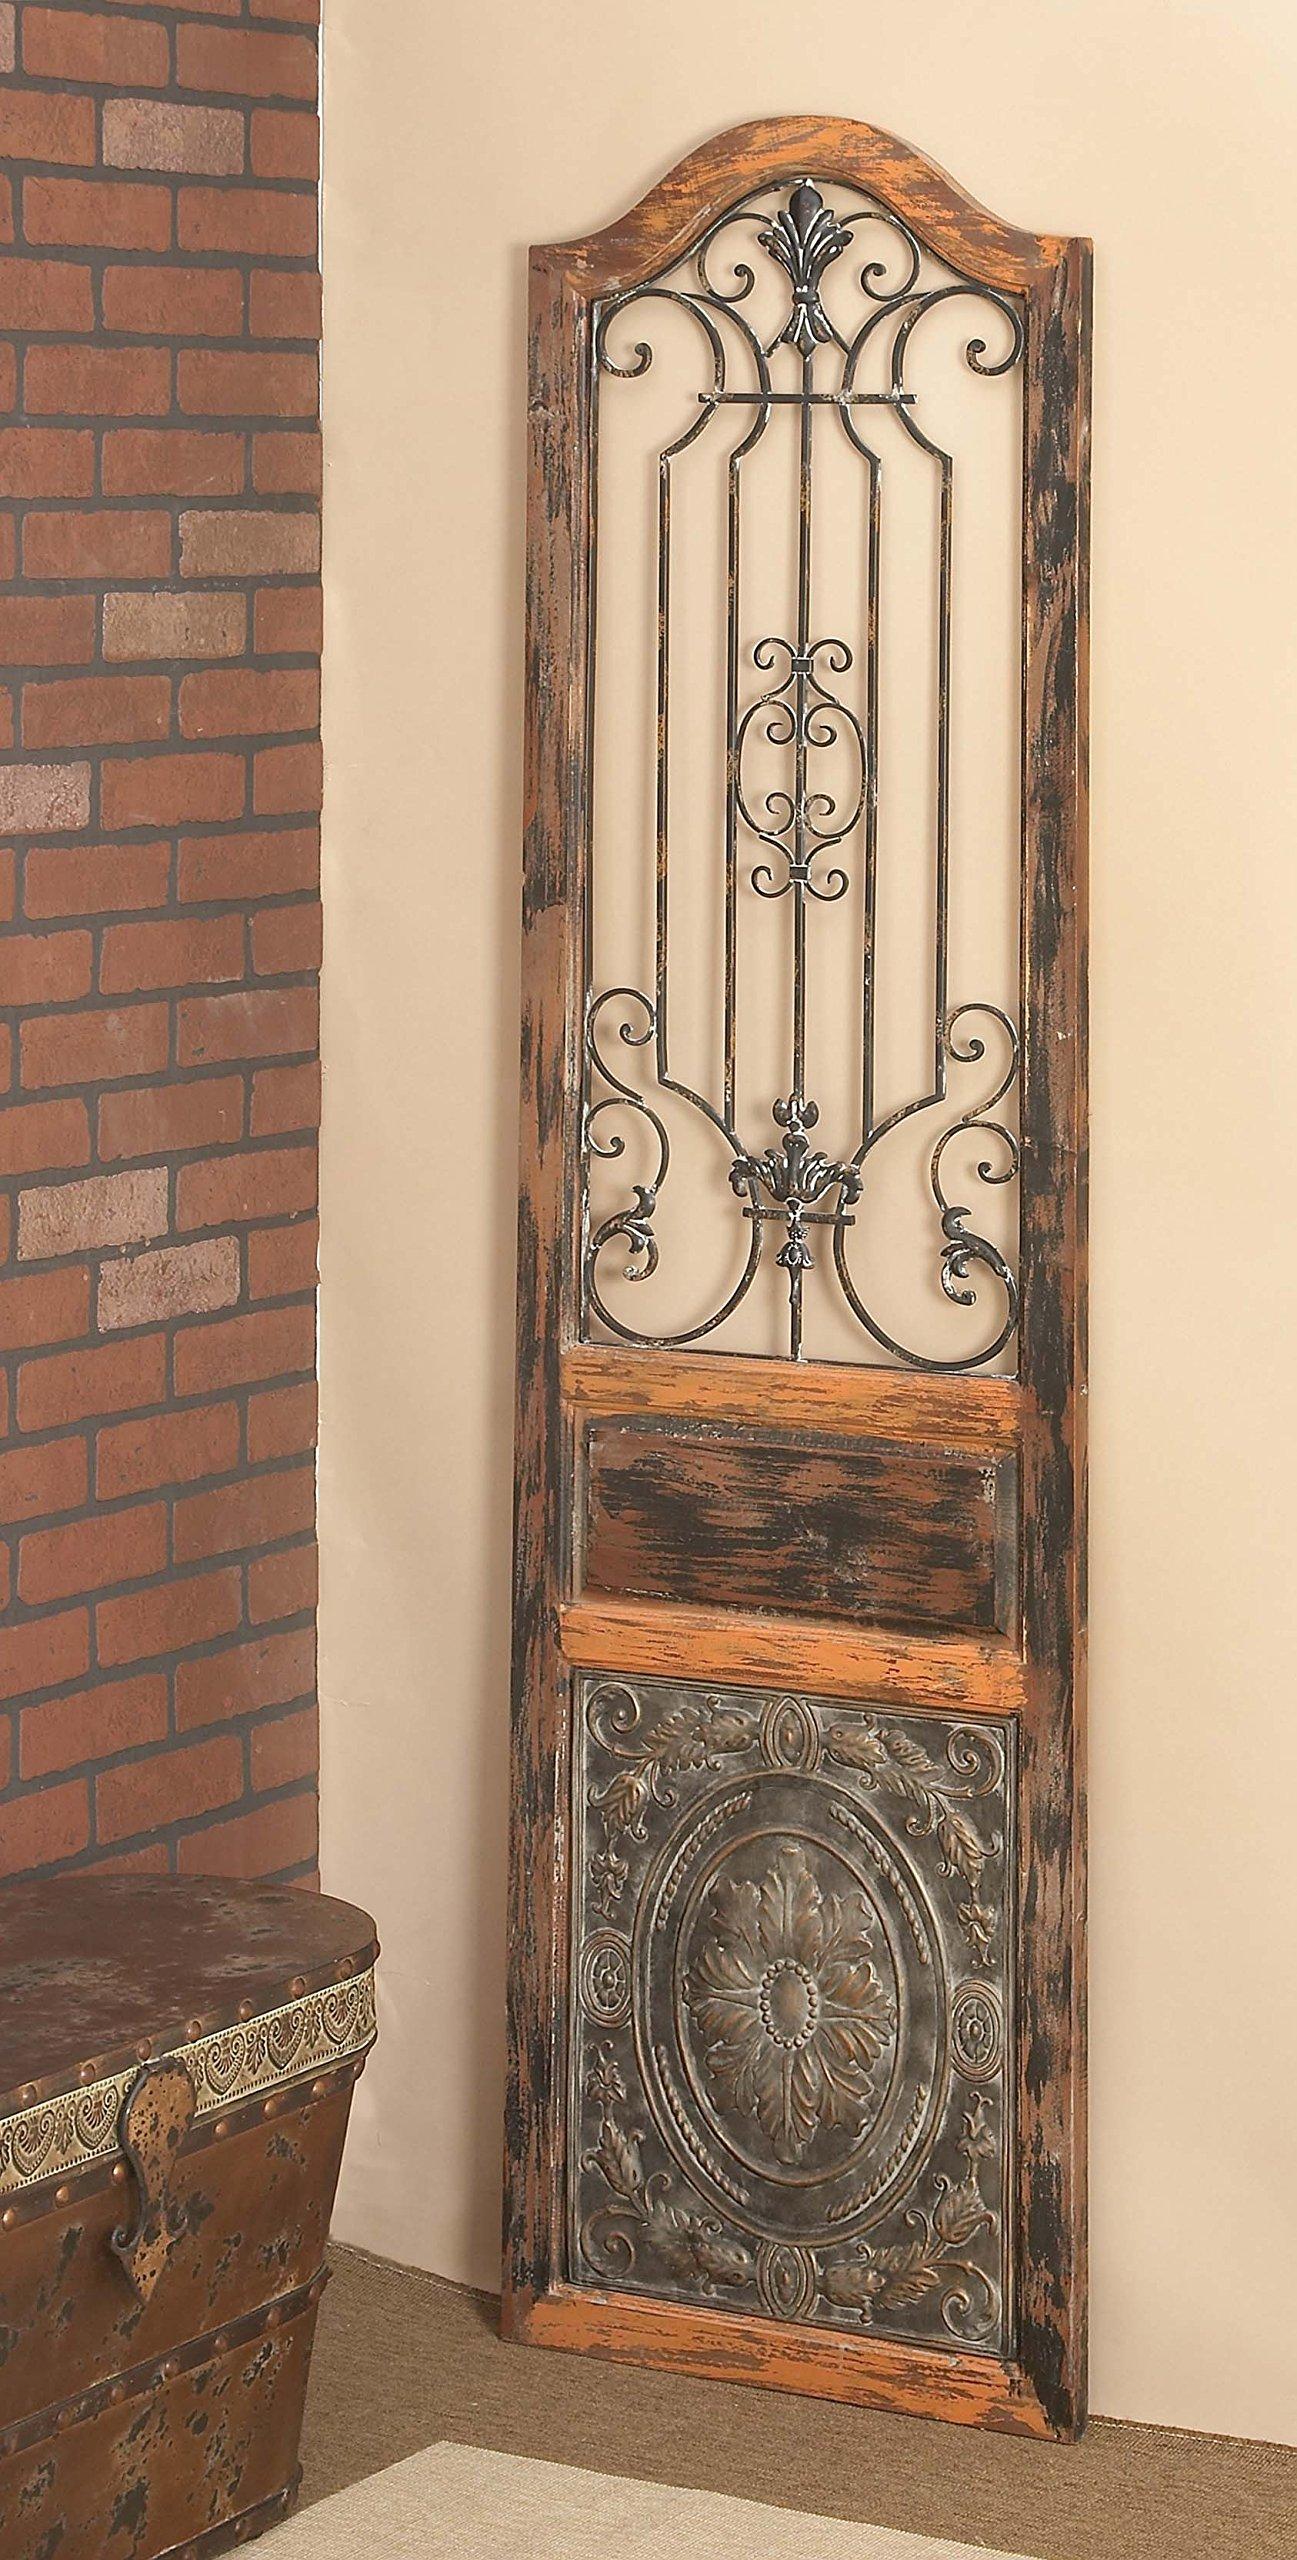 Deco 79 55832 Wood Metal Wall Decor